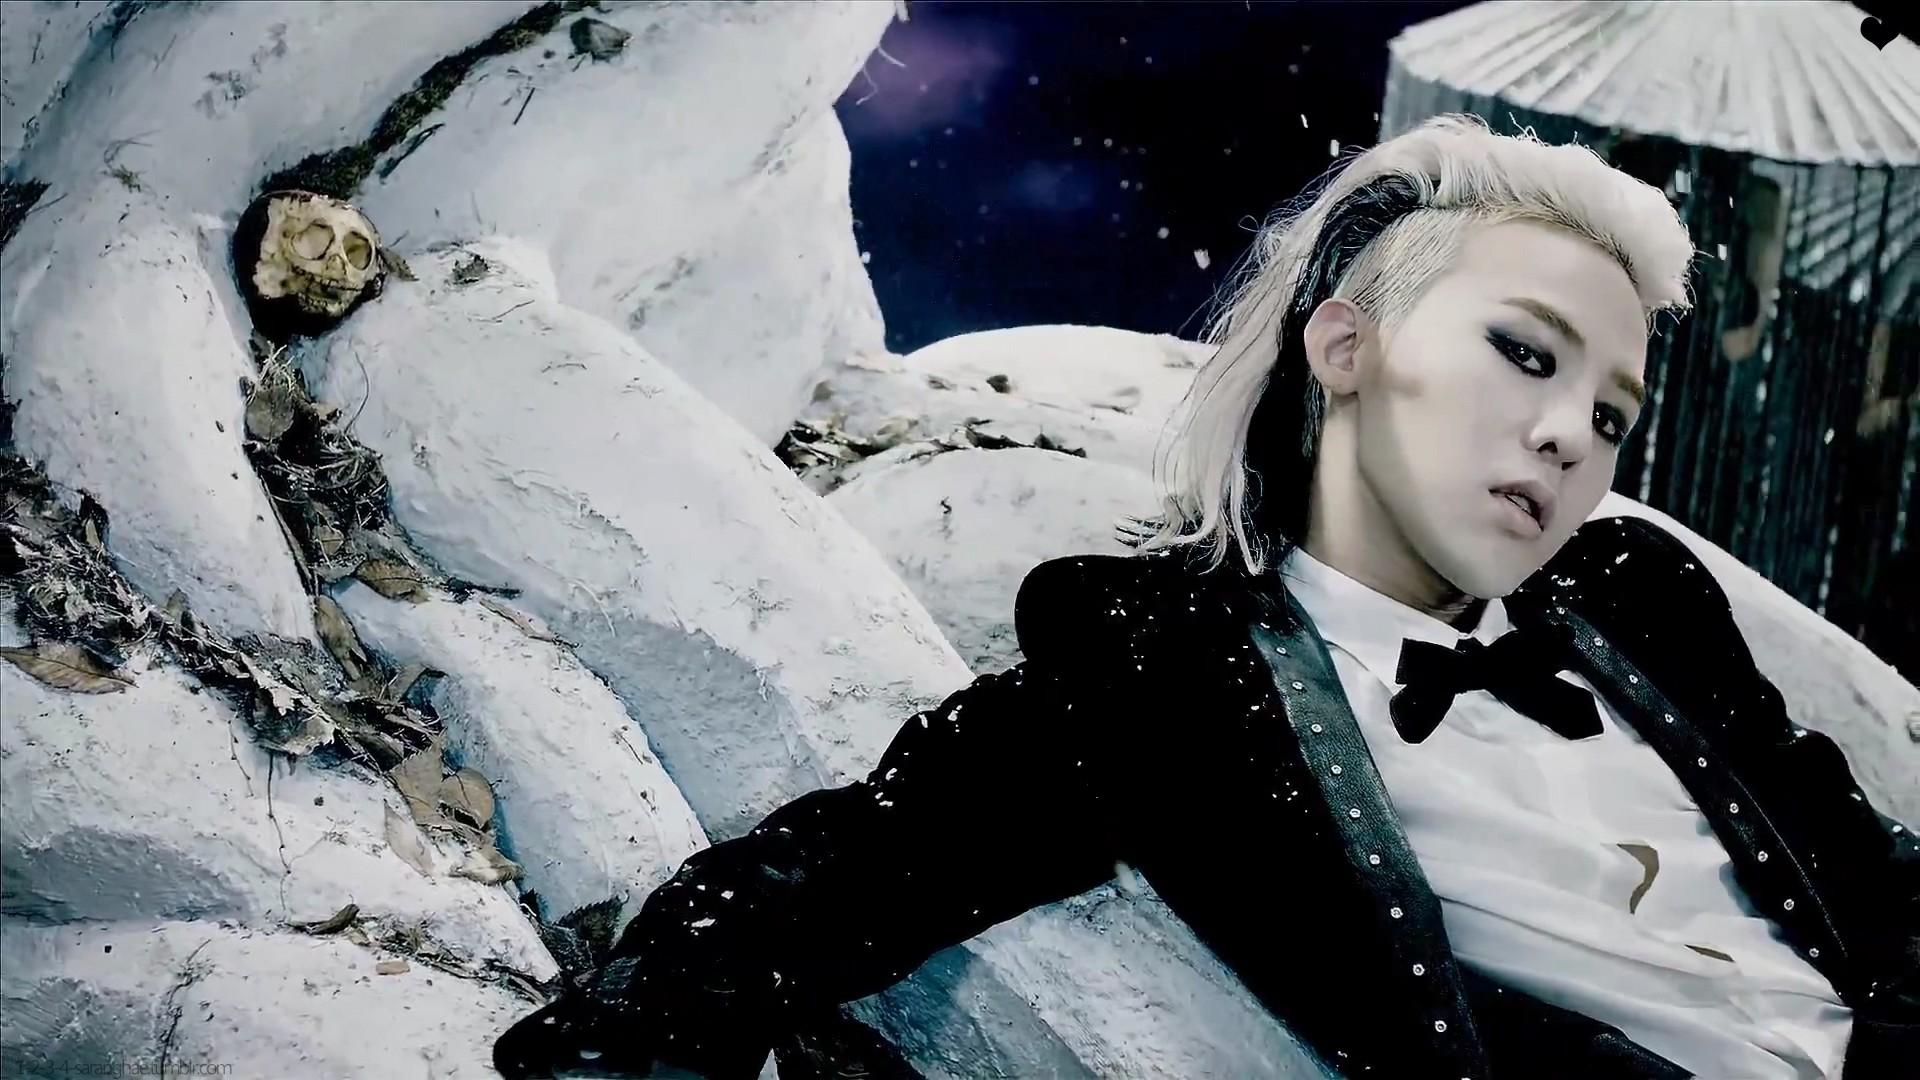 Taeyang Wallpapers 64 Images